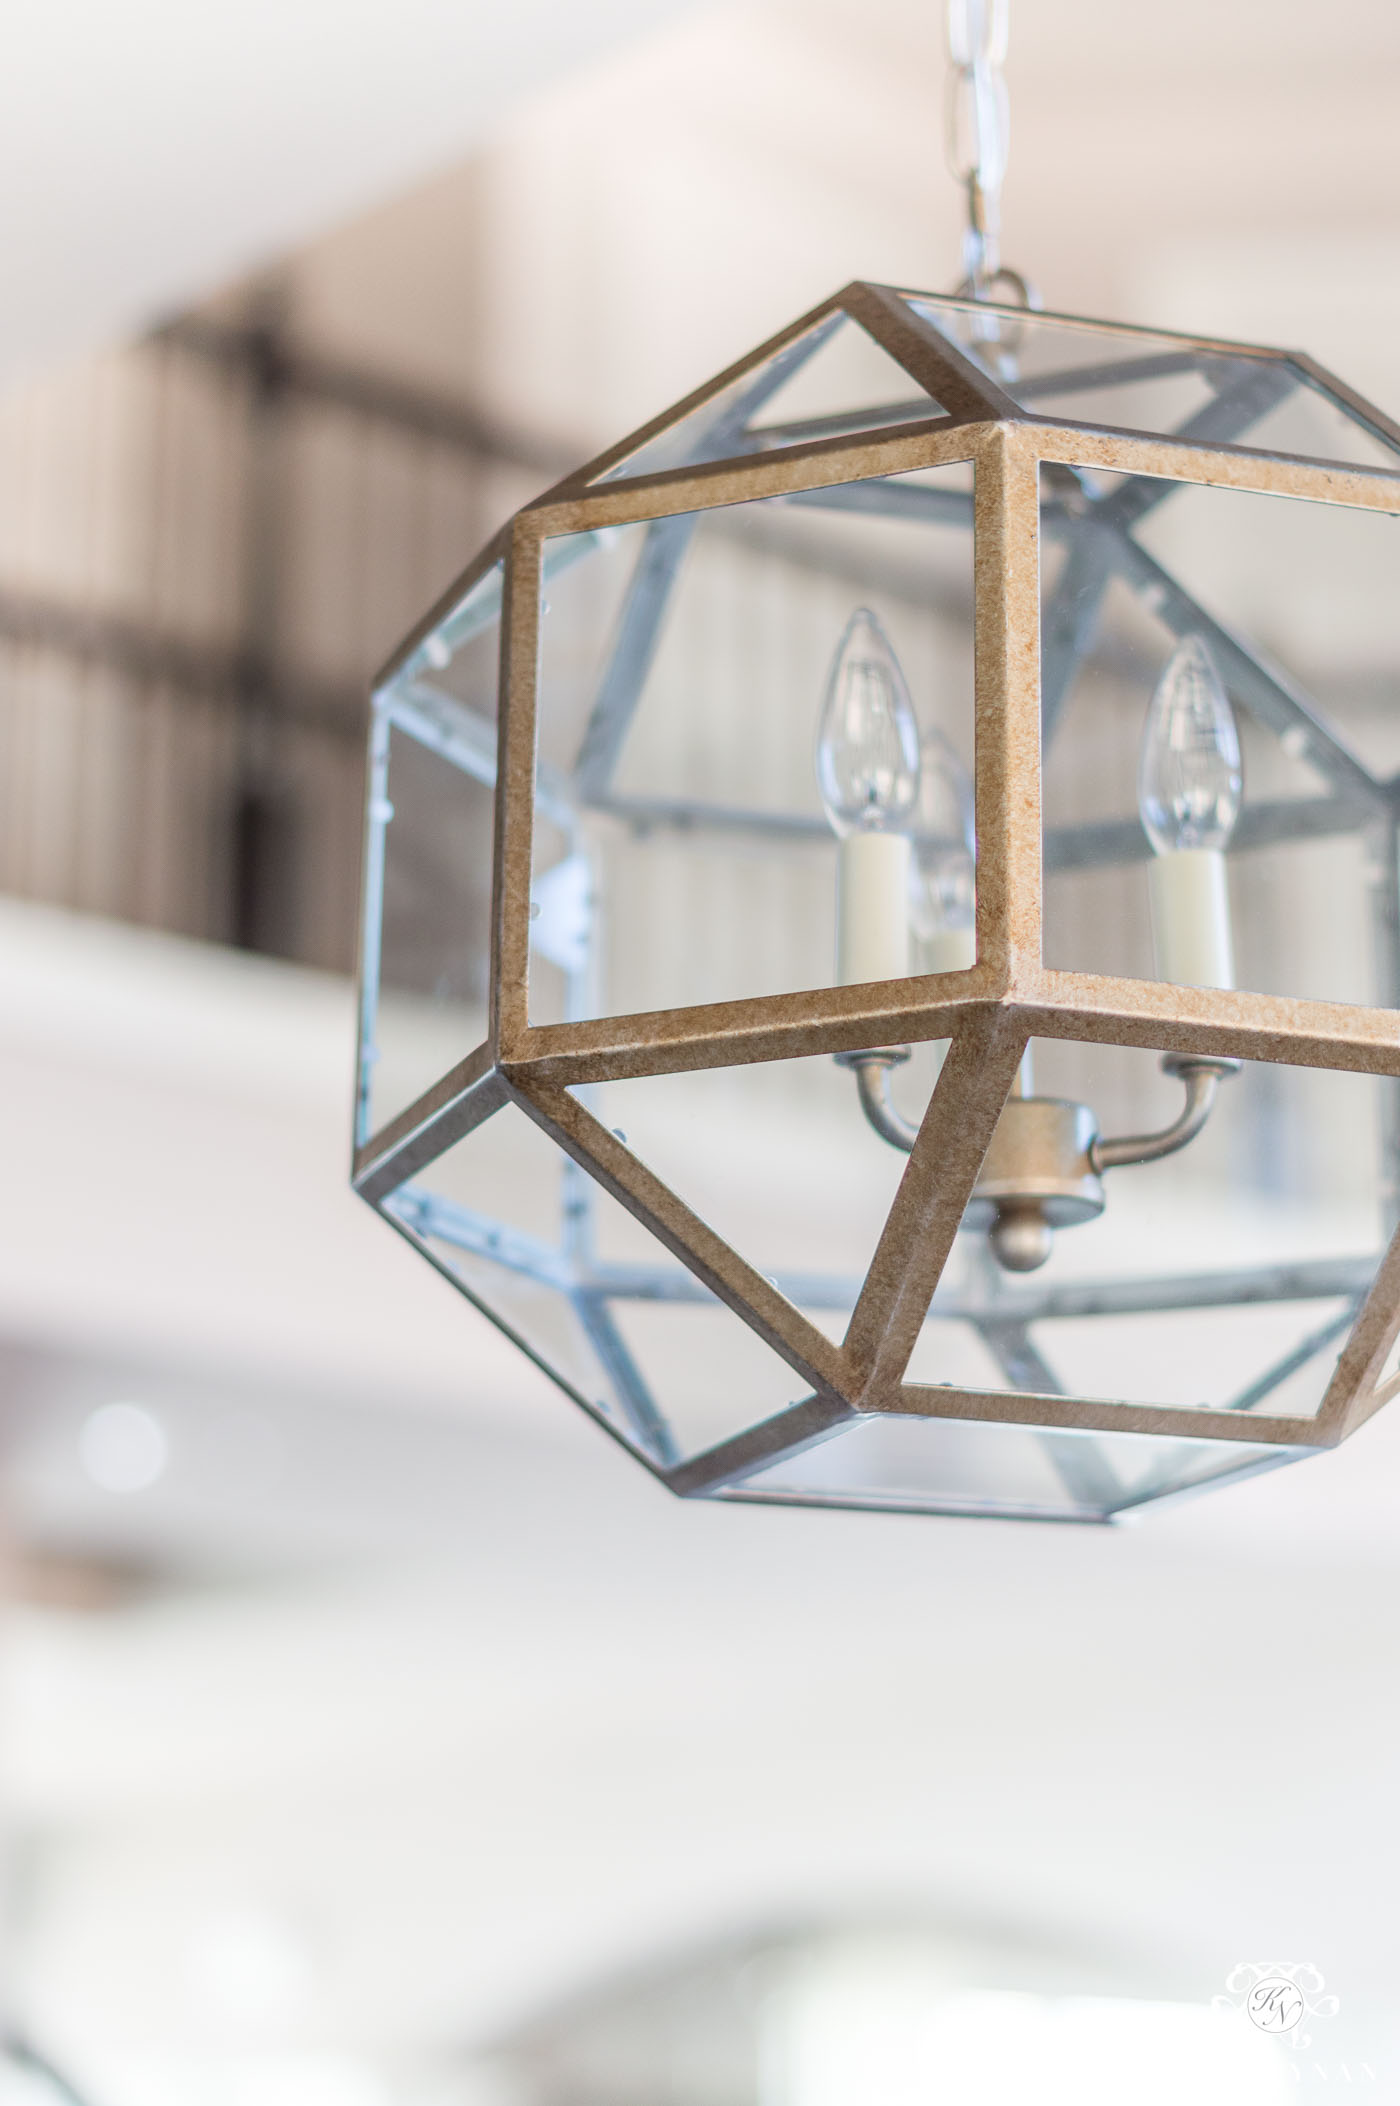 Improving Builder-Grade Light Fixtures to Affordable Transitional ...